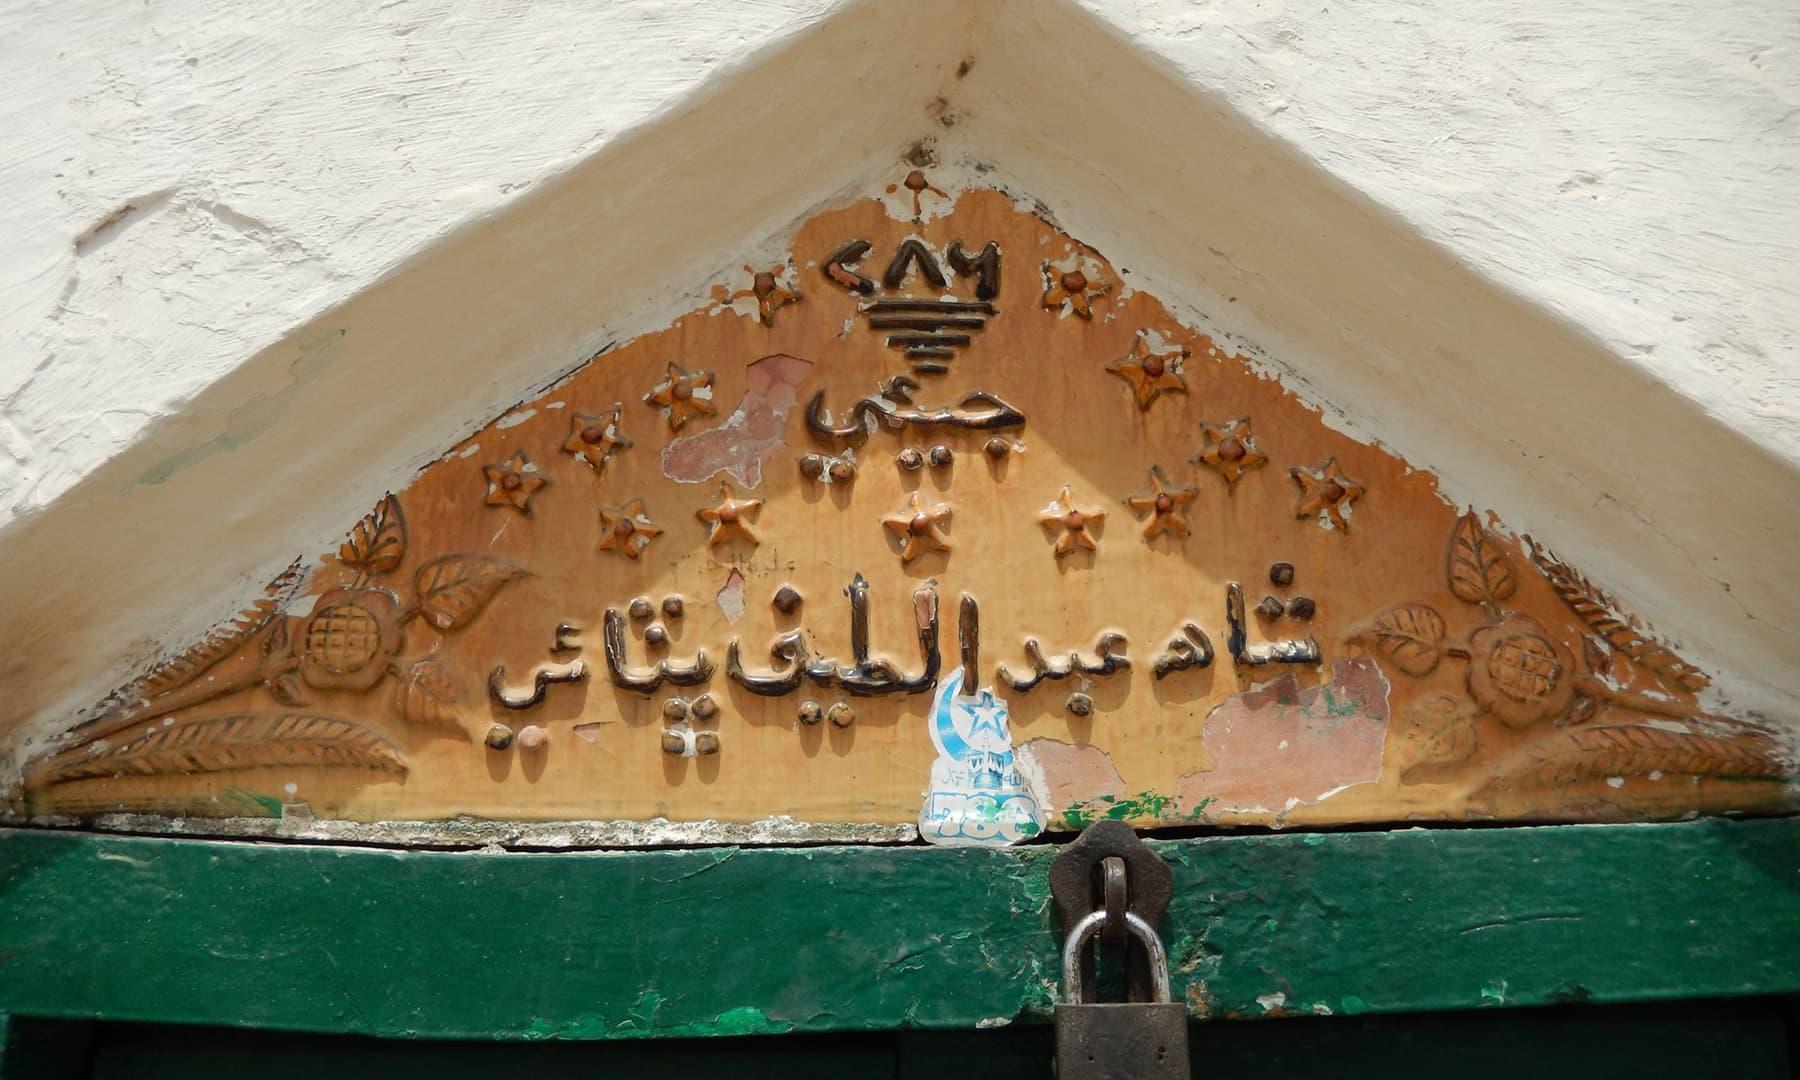 شاہ عبداللطیف بھٹائی کا آستانہ—ابوبکر شیخ